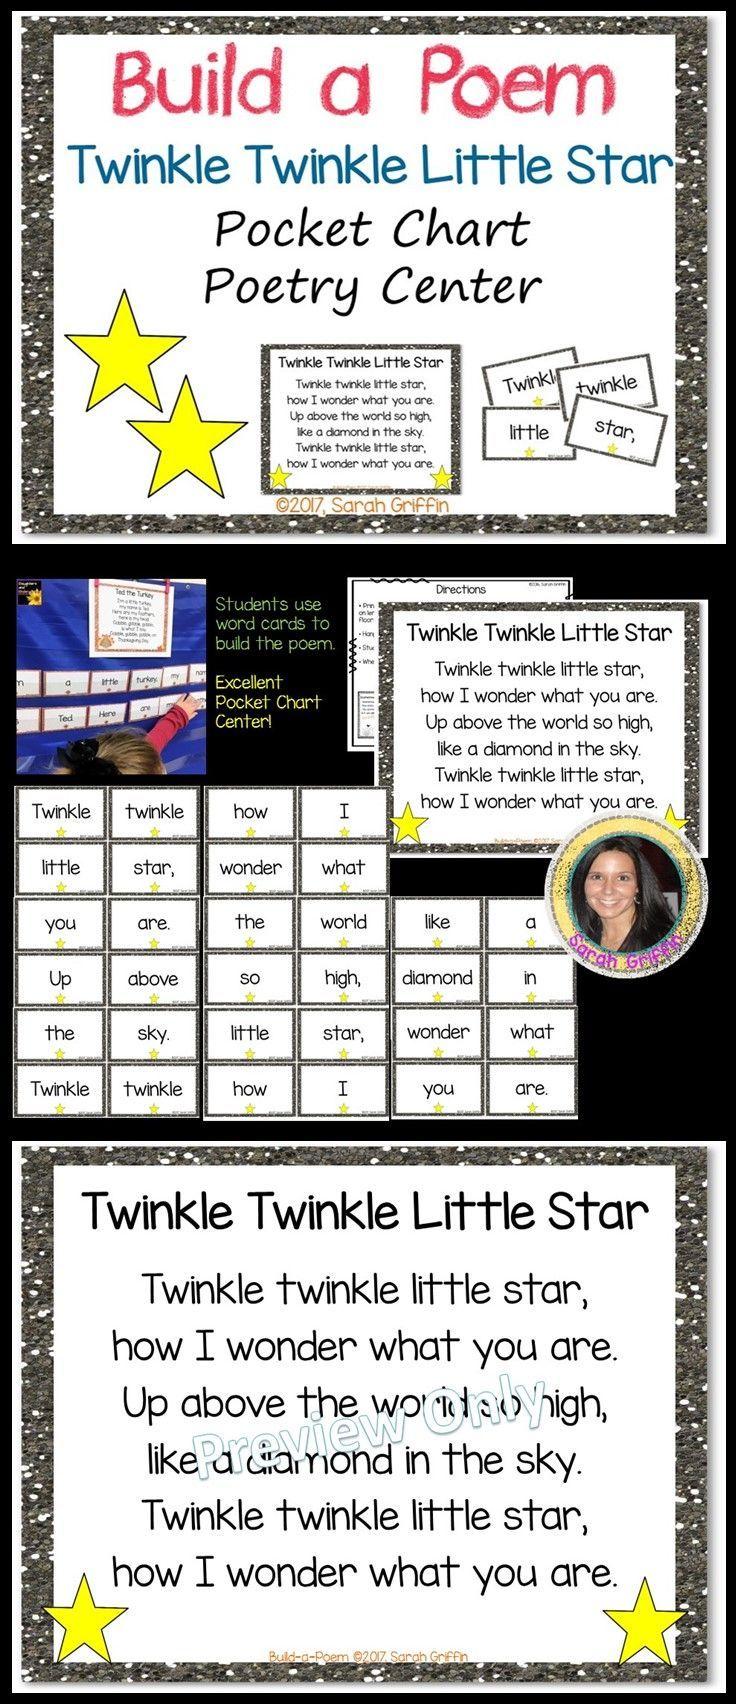 Twinkle twinkle poem